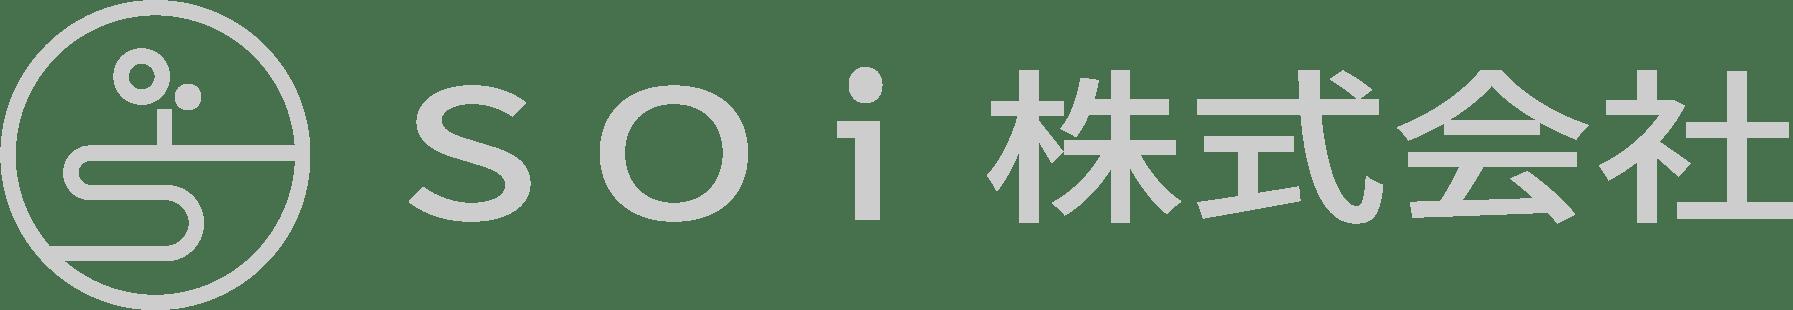 SOi株式会社 | 経営革新等支援機関